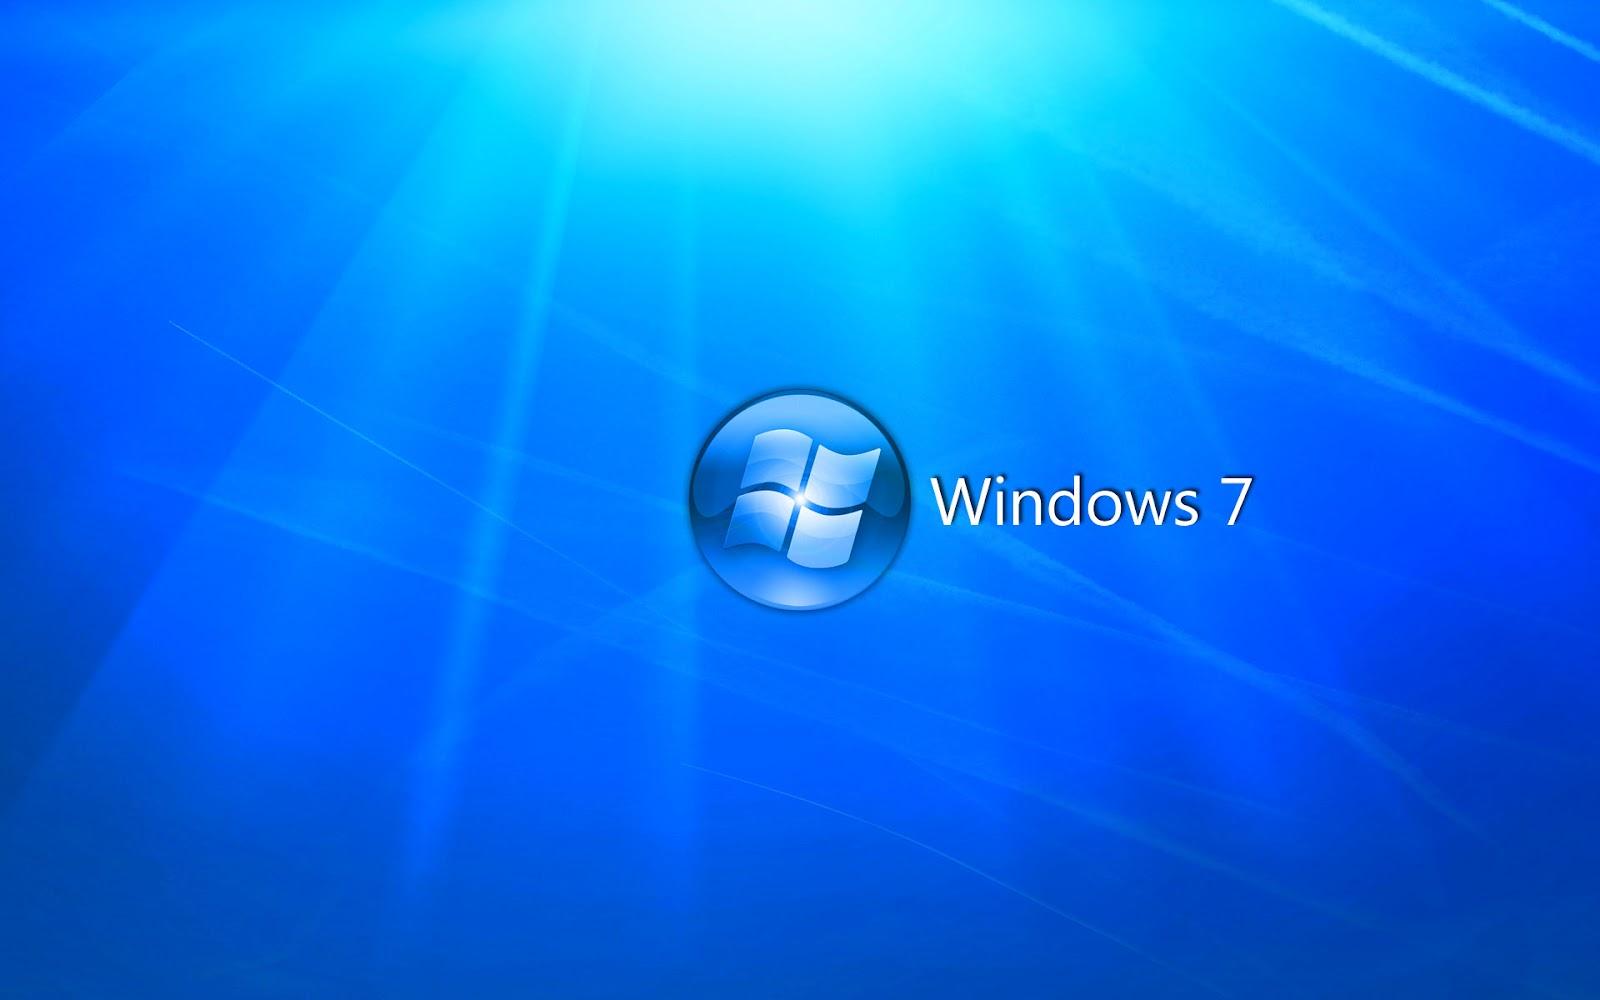 Windows 7 hd beautiful wallpapers hd wallpapers rooteto - Windows 7 love wallpapers ...